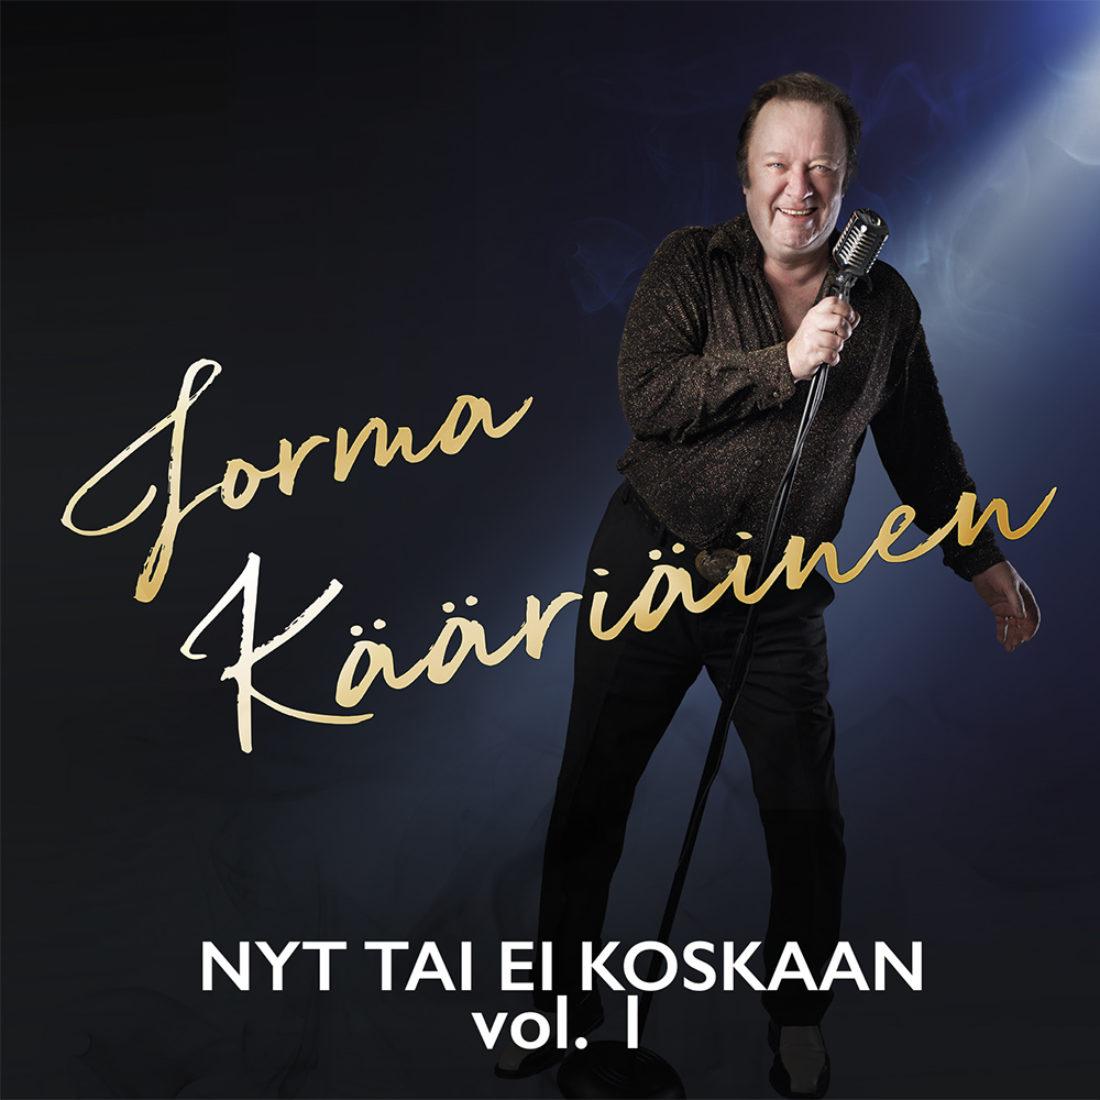 Jorma_NTEK_kansi_1000x1000